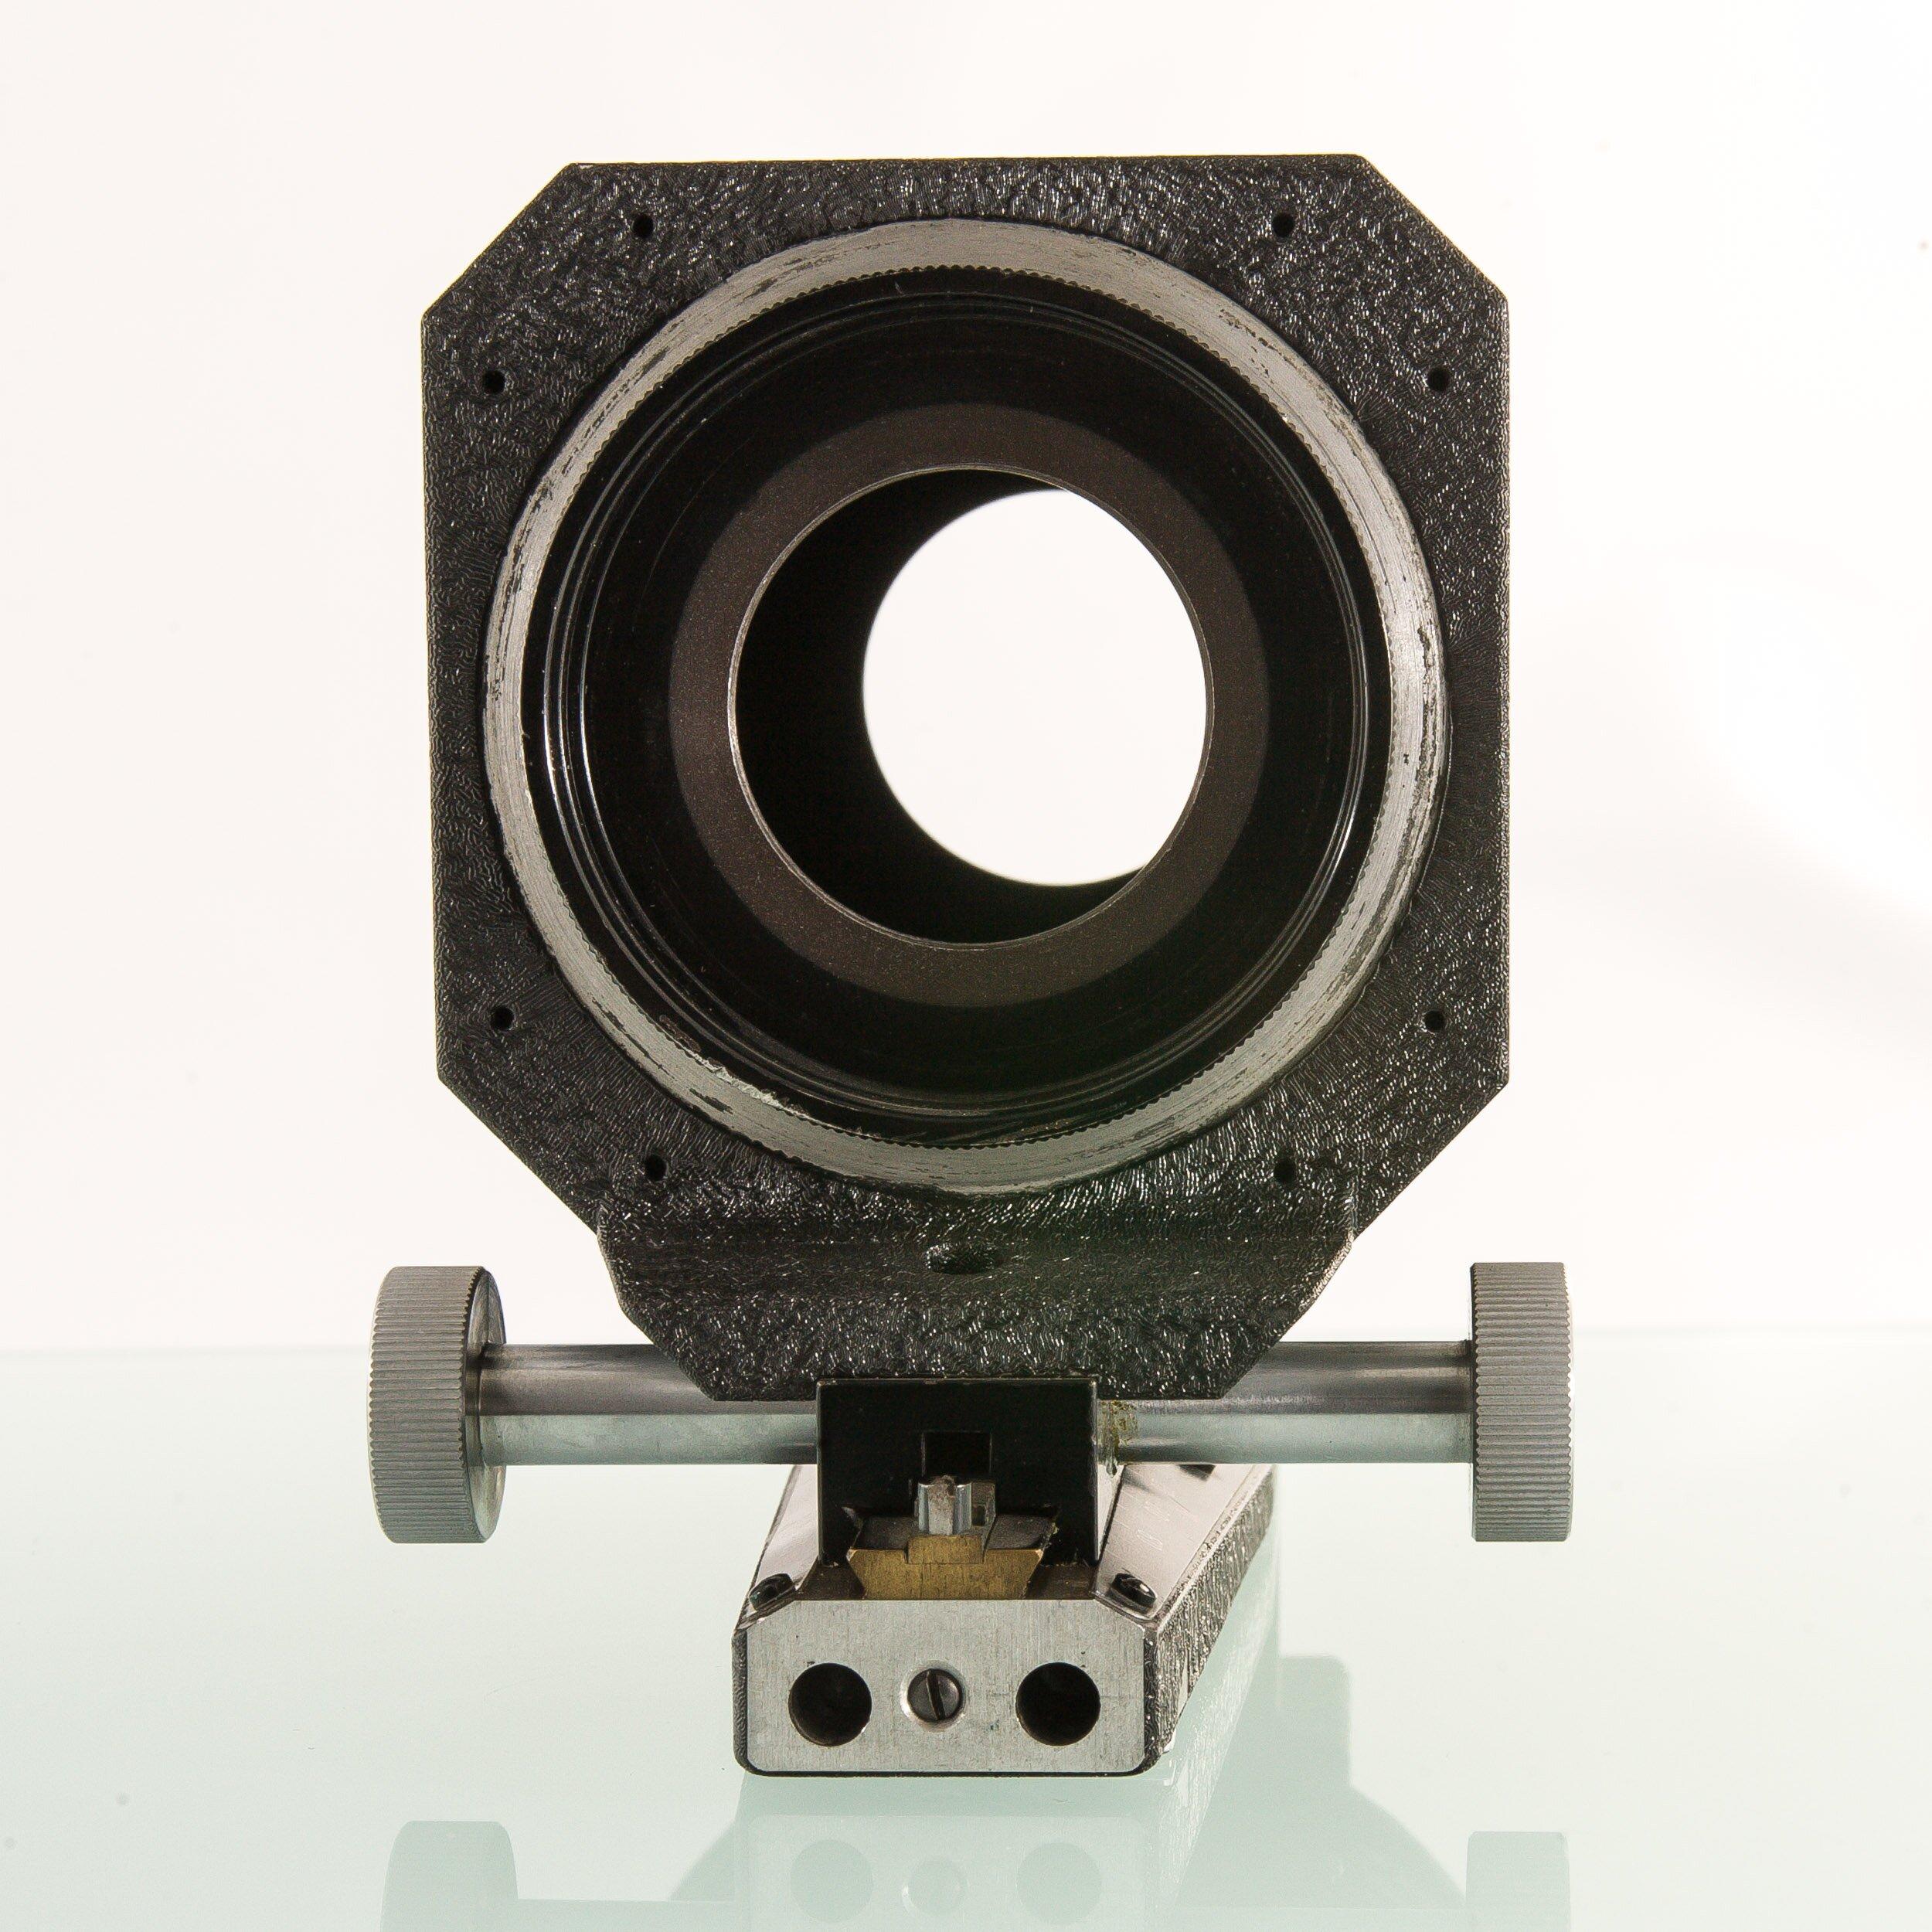 Leica M39 Balgengerät